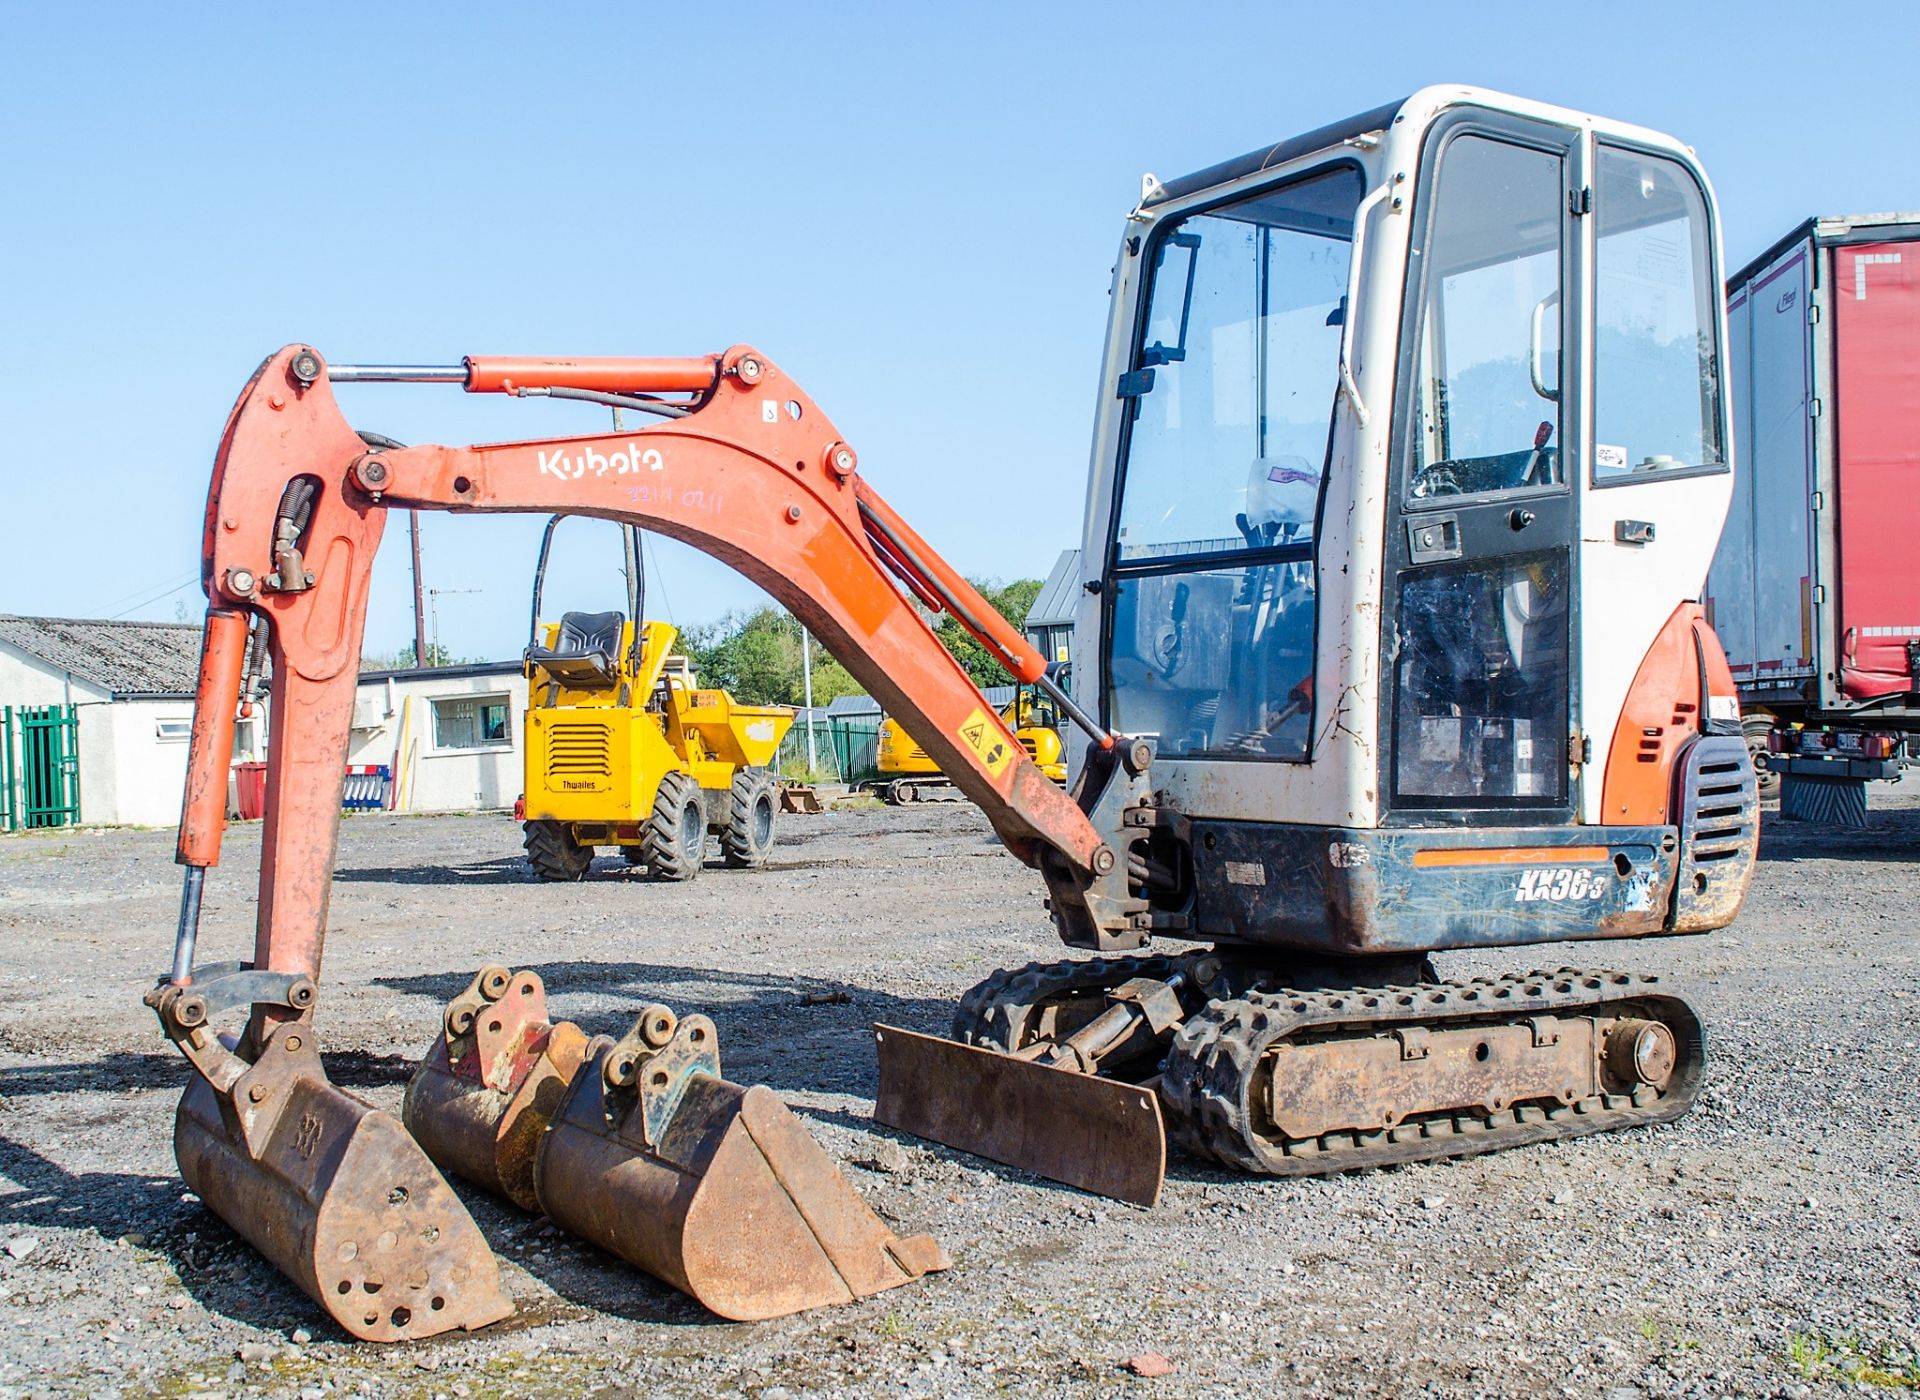 Kubota KX36-3 1.5 tonne rubber tracked mini excavator Year: 2007 S/N: Z077298 Recorded Hours: 4205